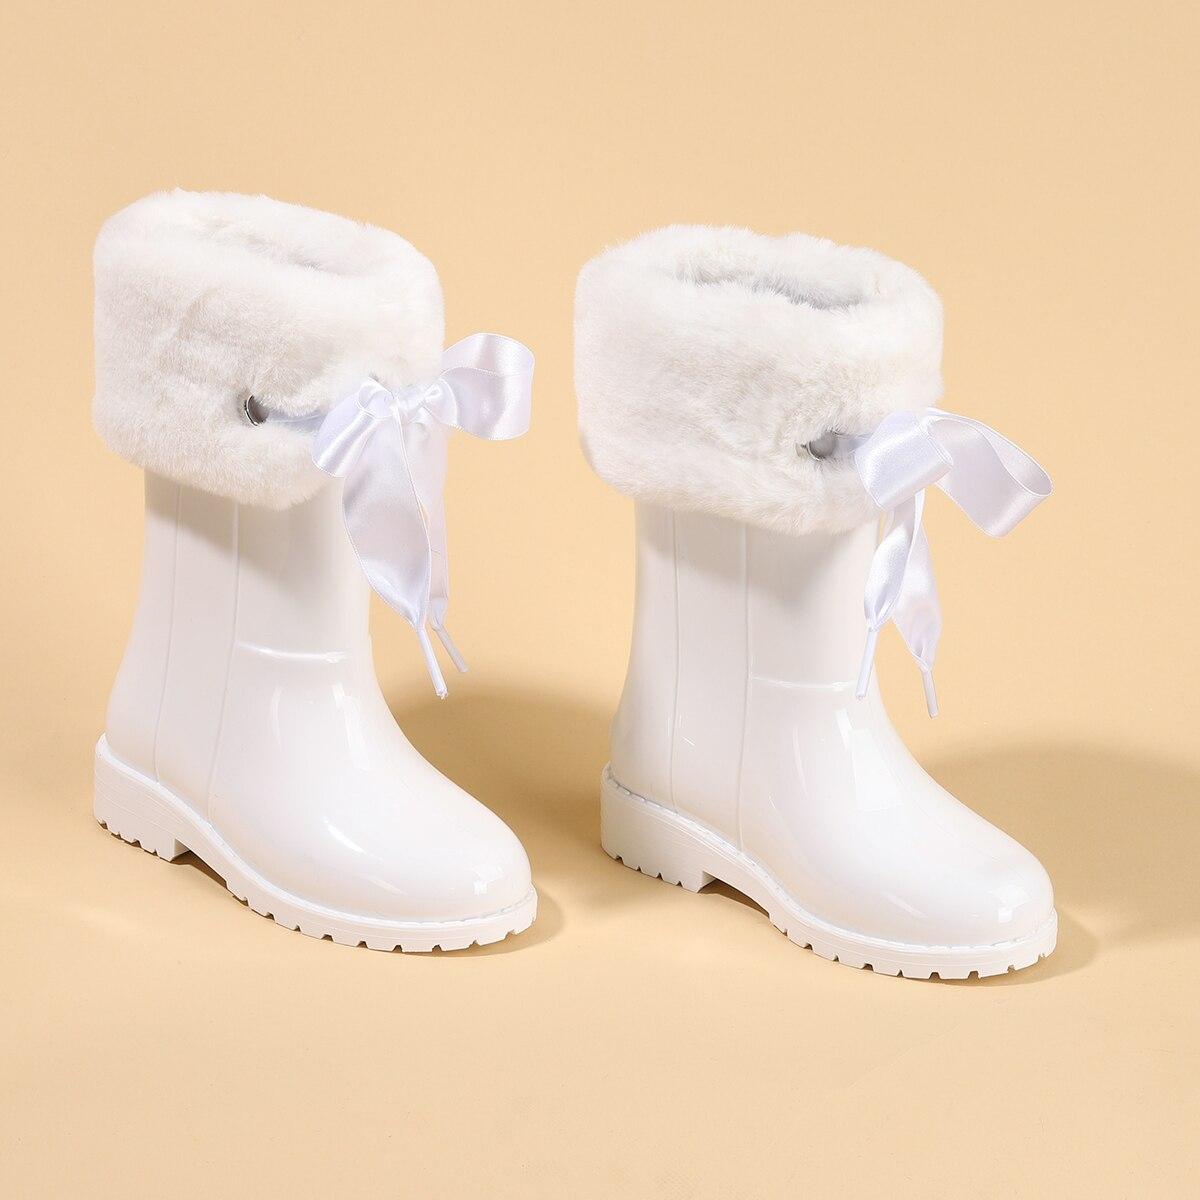 İgor W10239 Campera Charol Soft Female Child Waterproof Rain Snow Boot enlarge